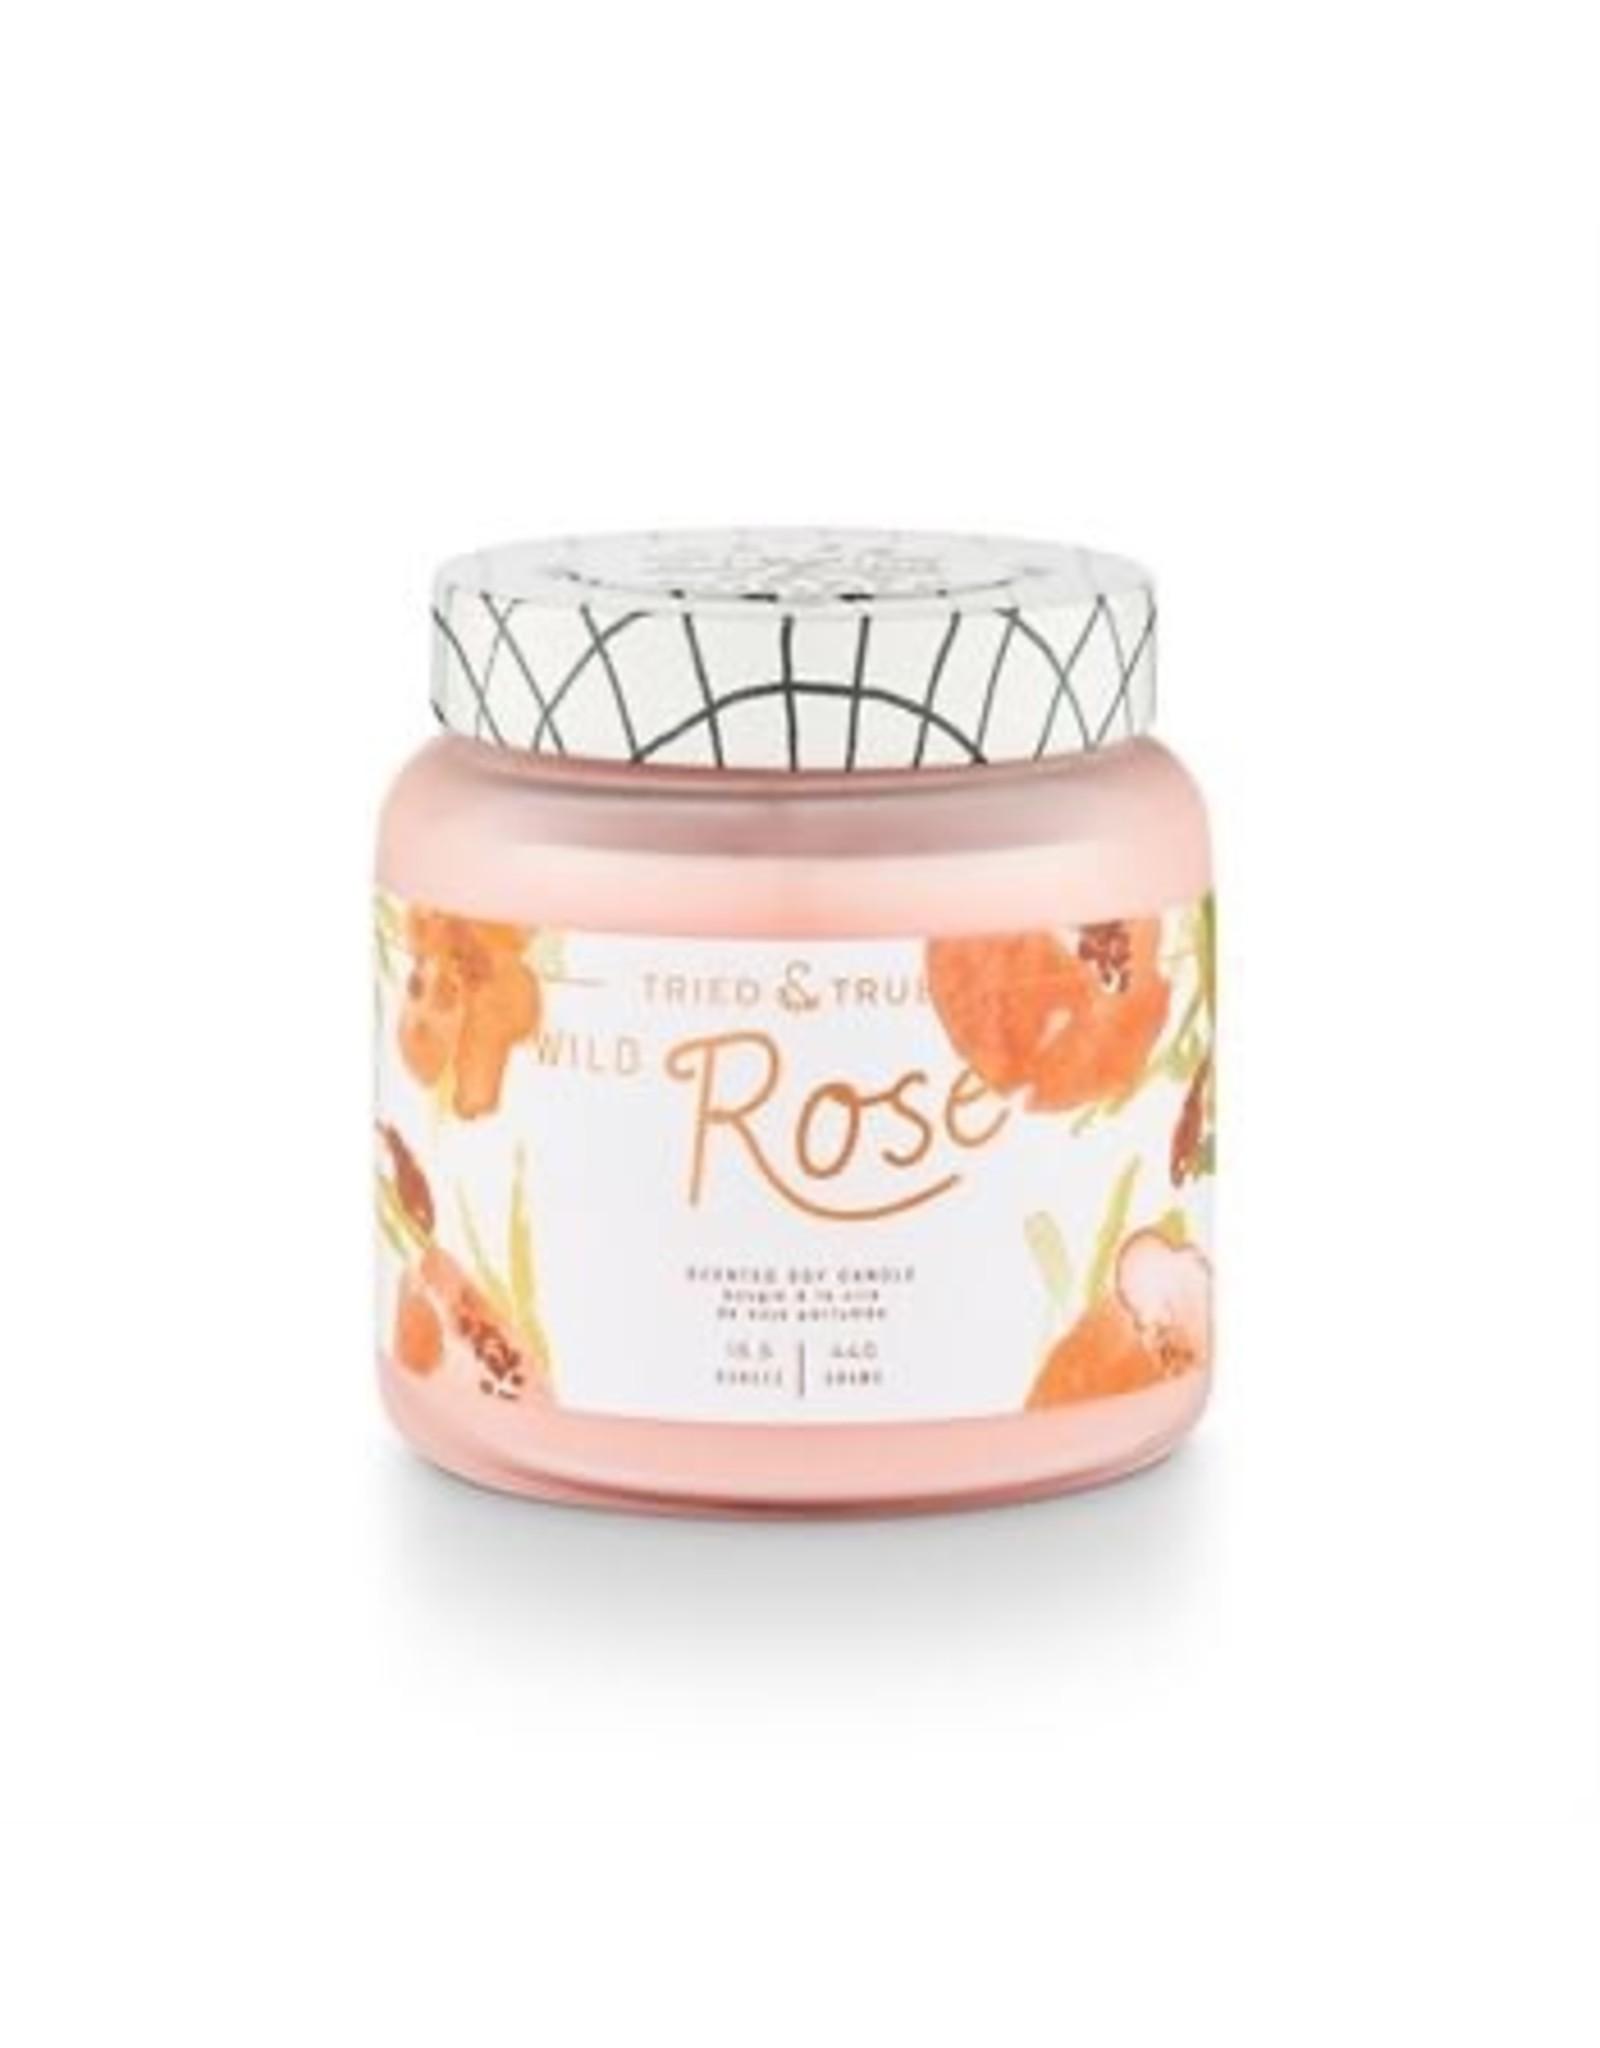 Tried & True 15.5 oz Soy Glass Jar Candle - Wild Rose